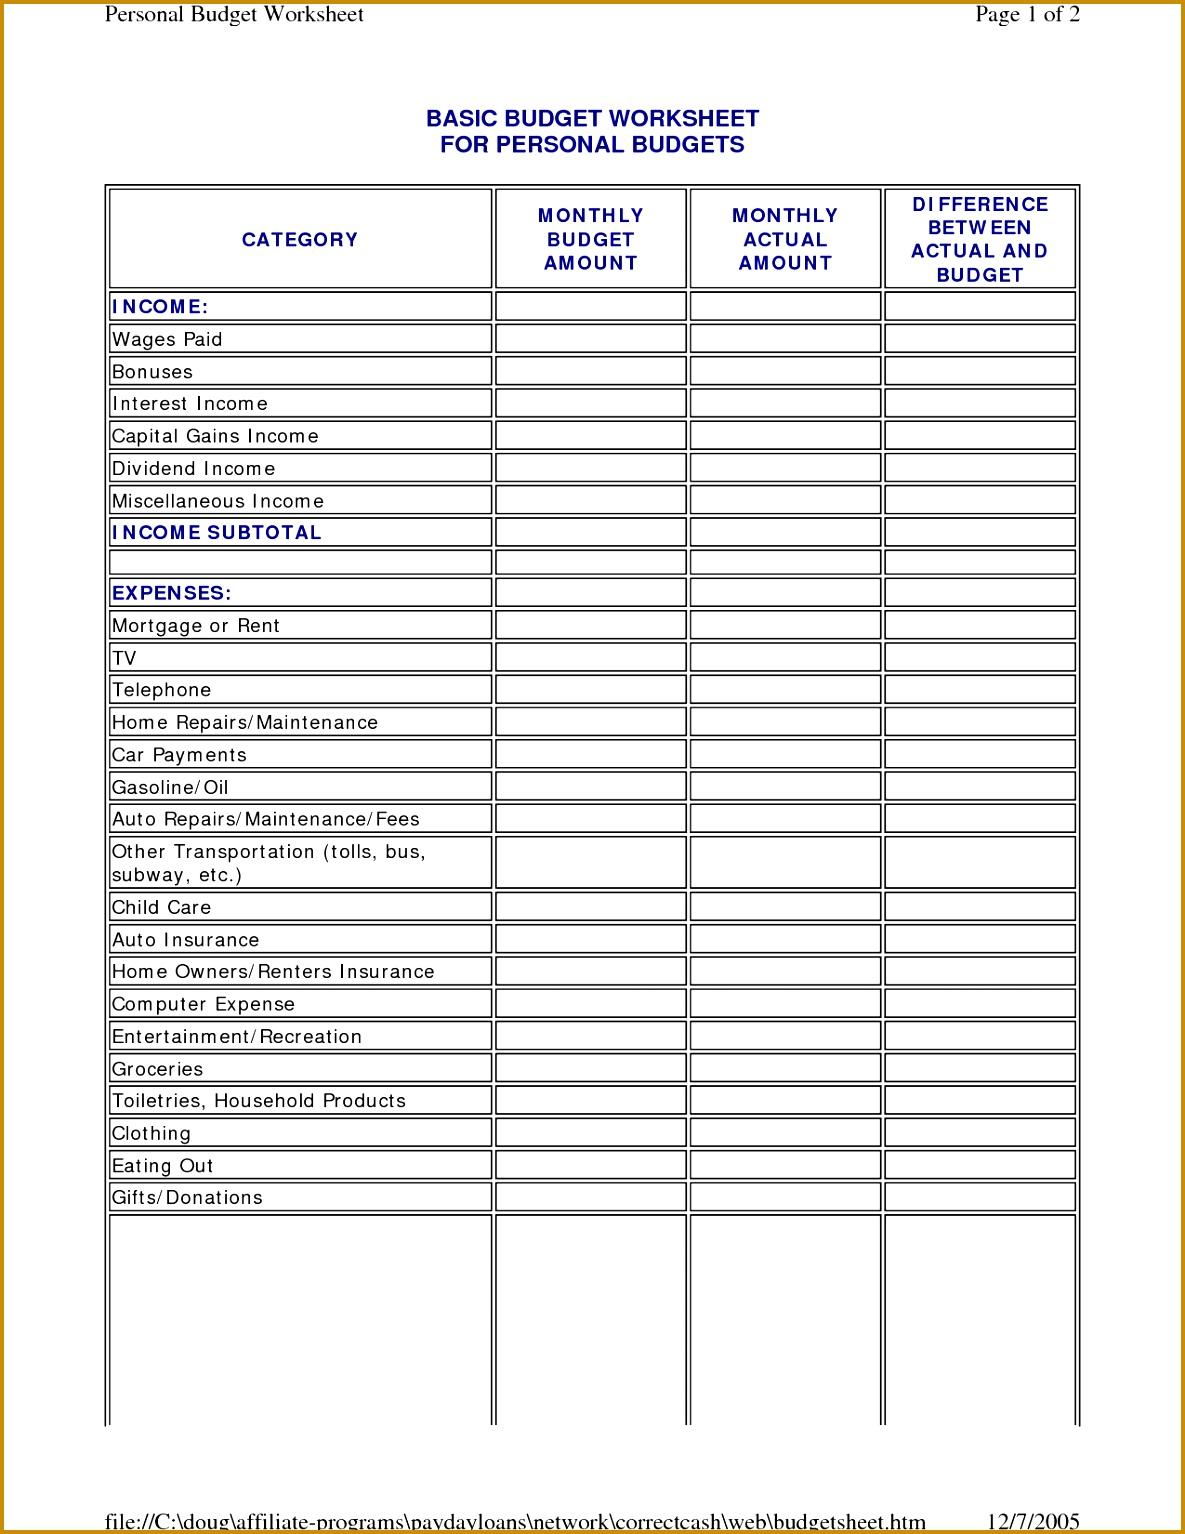 Basic Bud Worksheet Template 11851534